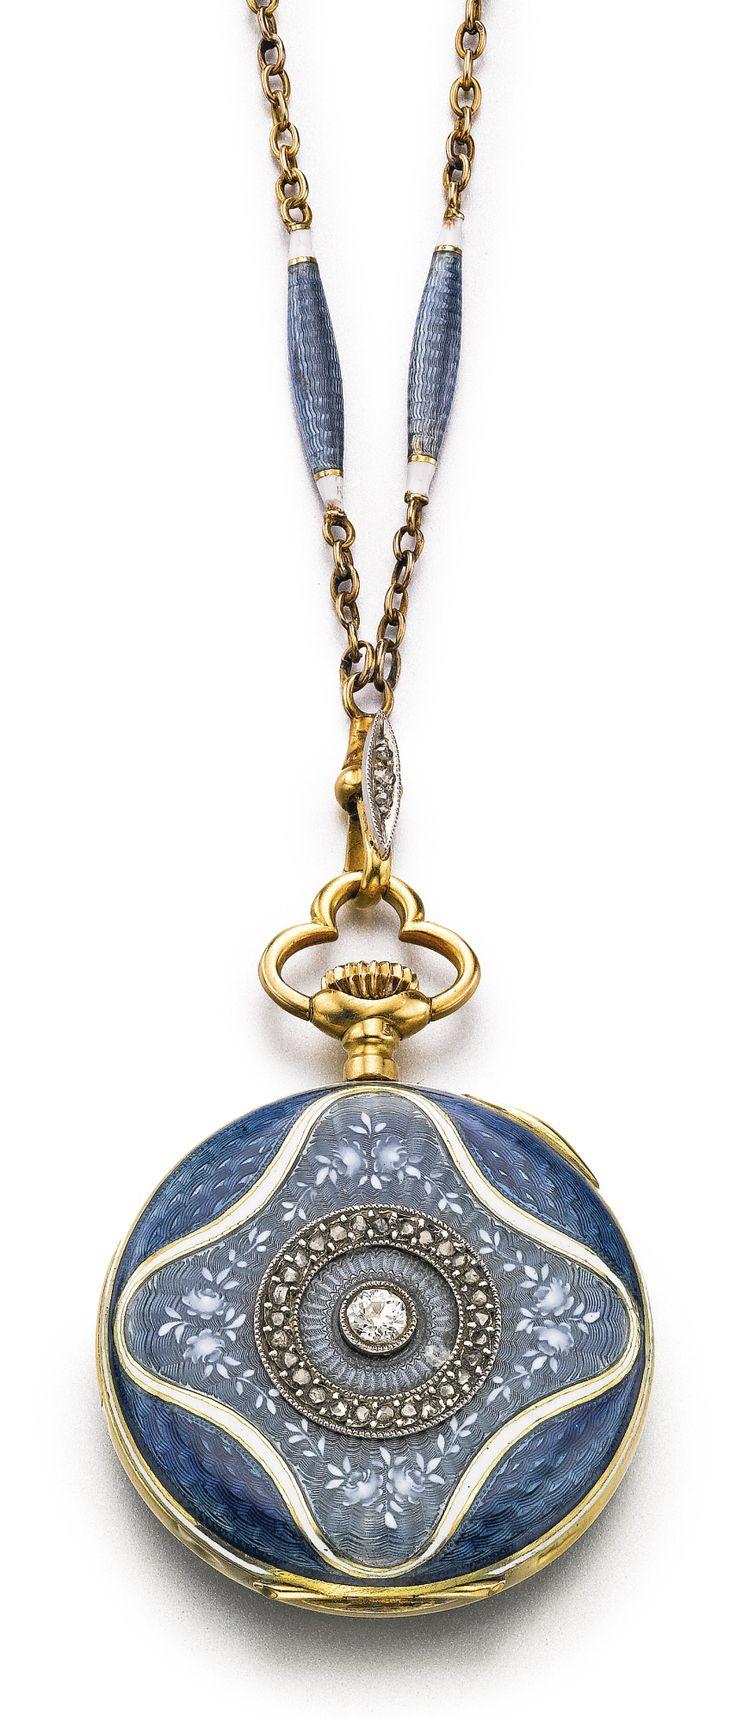 VULCAIN AN 18K YELLOW GOLD, ENAMEL AND DIAMOND-SET OPEN-FACED PENDANT WATCH WITH CHAIN CIRCA 1900